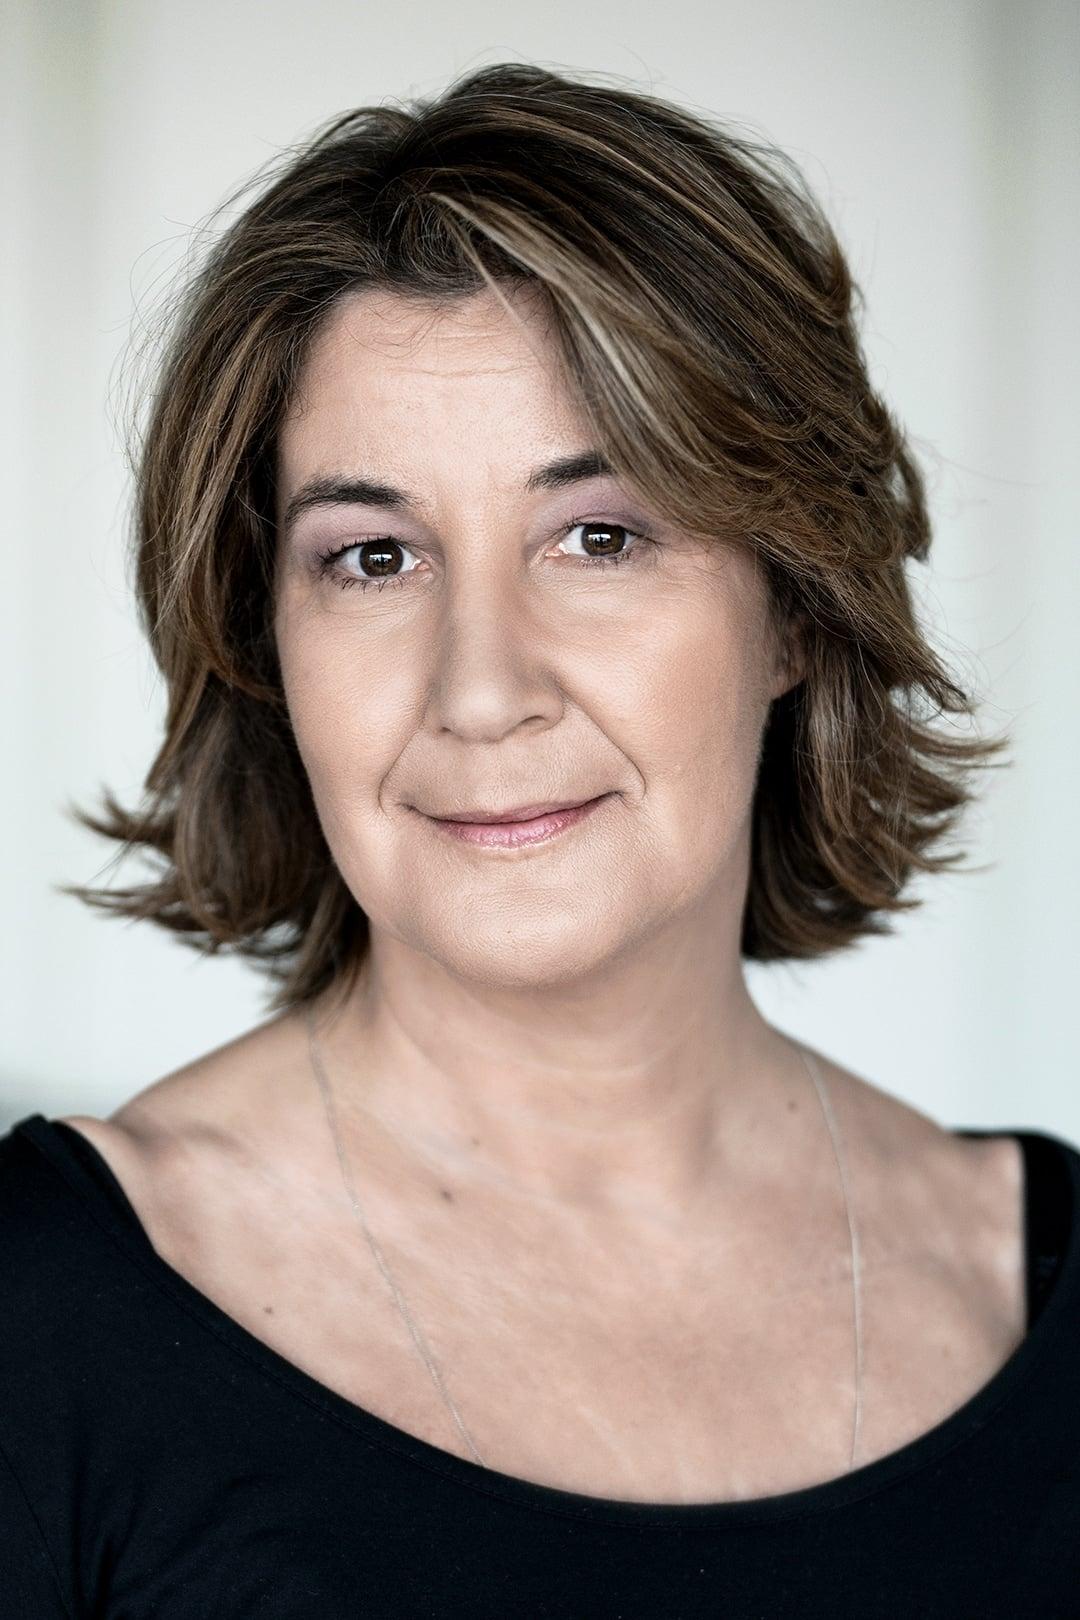 Claudia Kratochvil